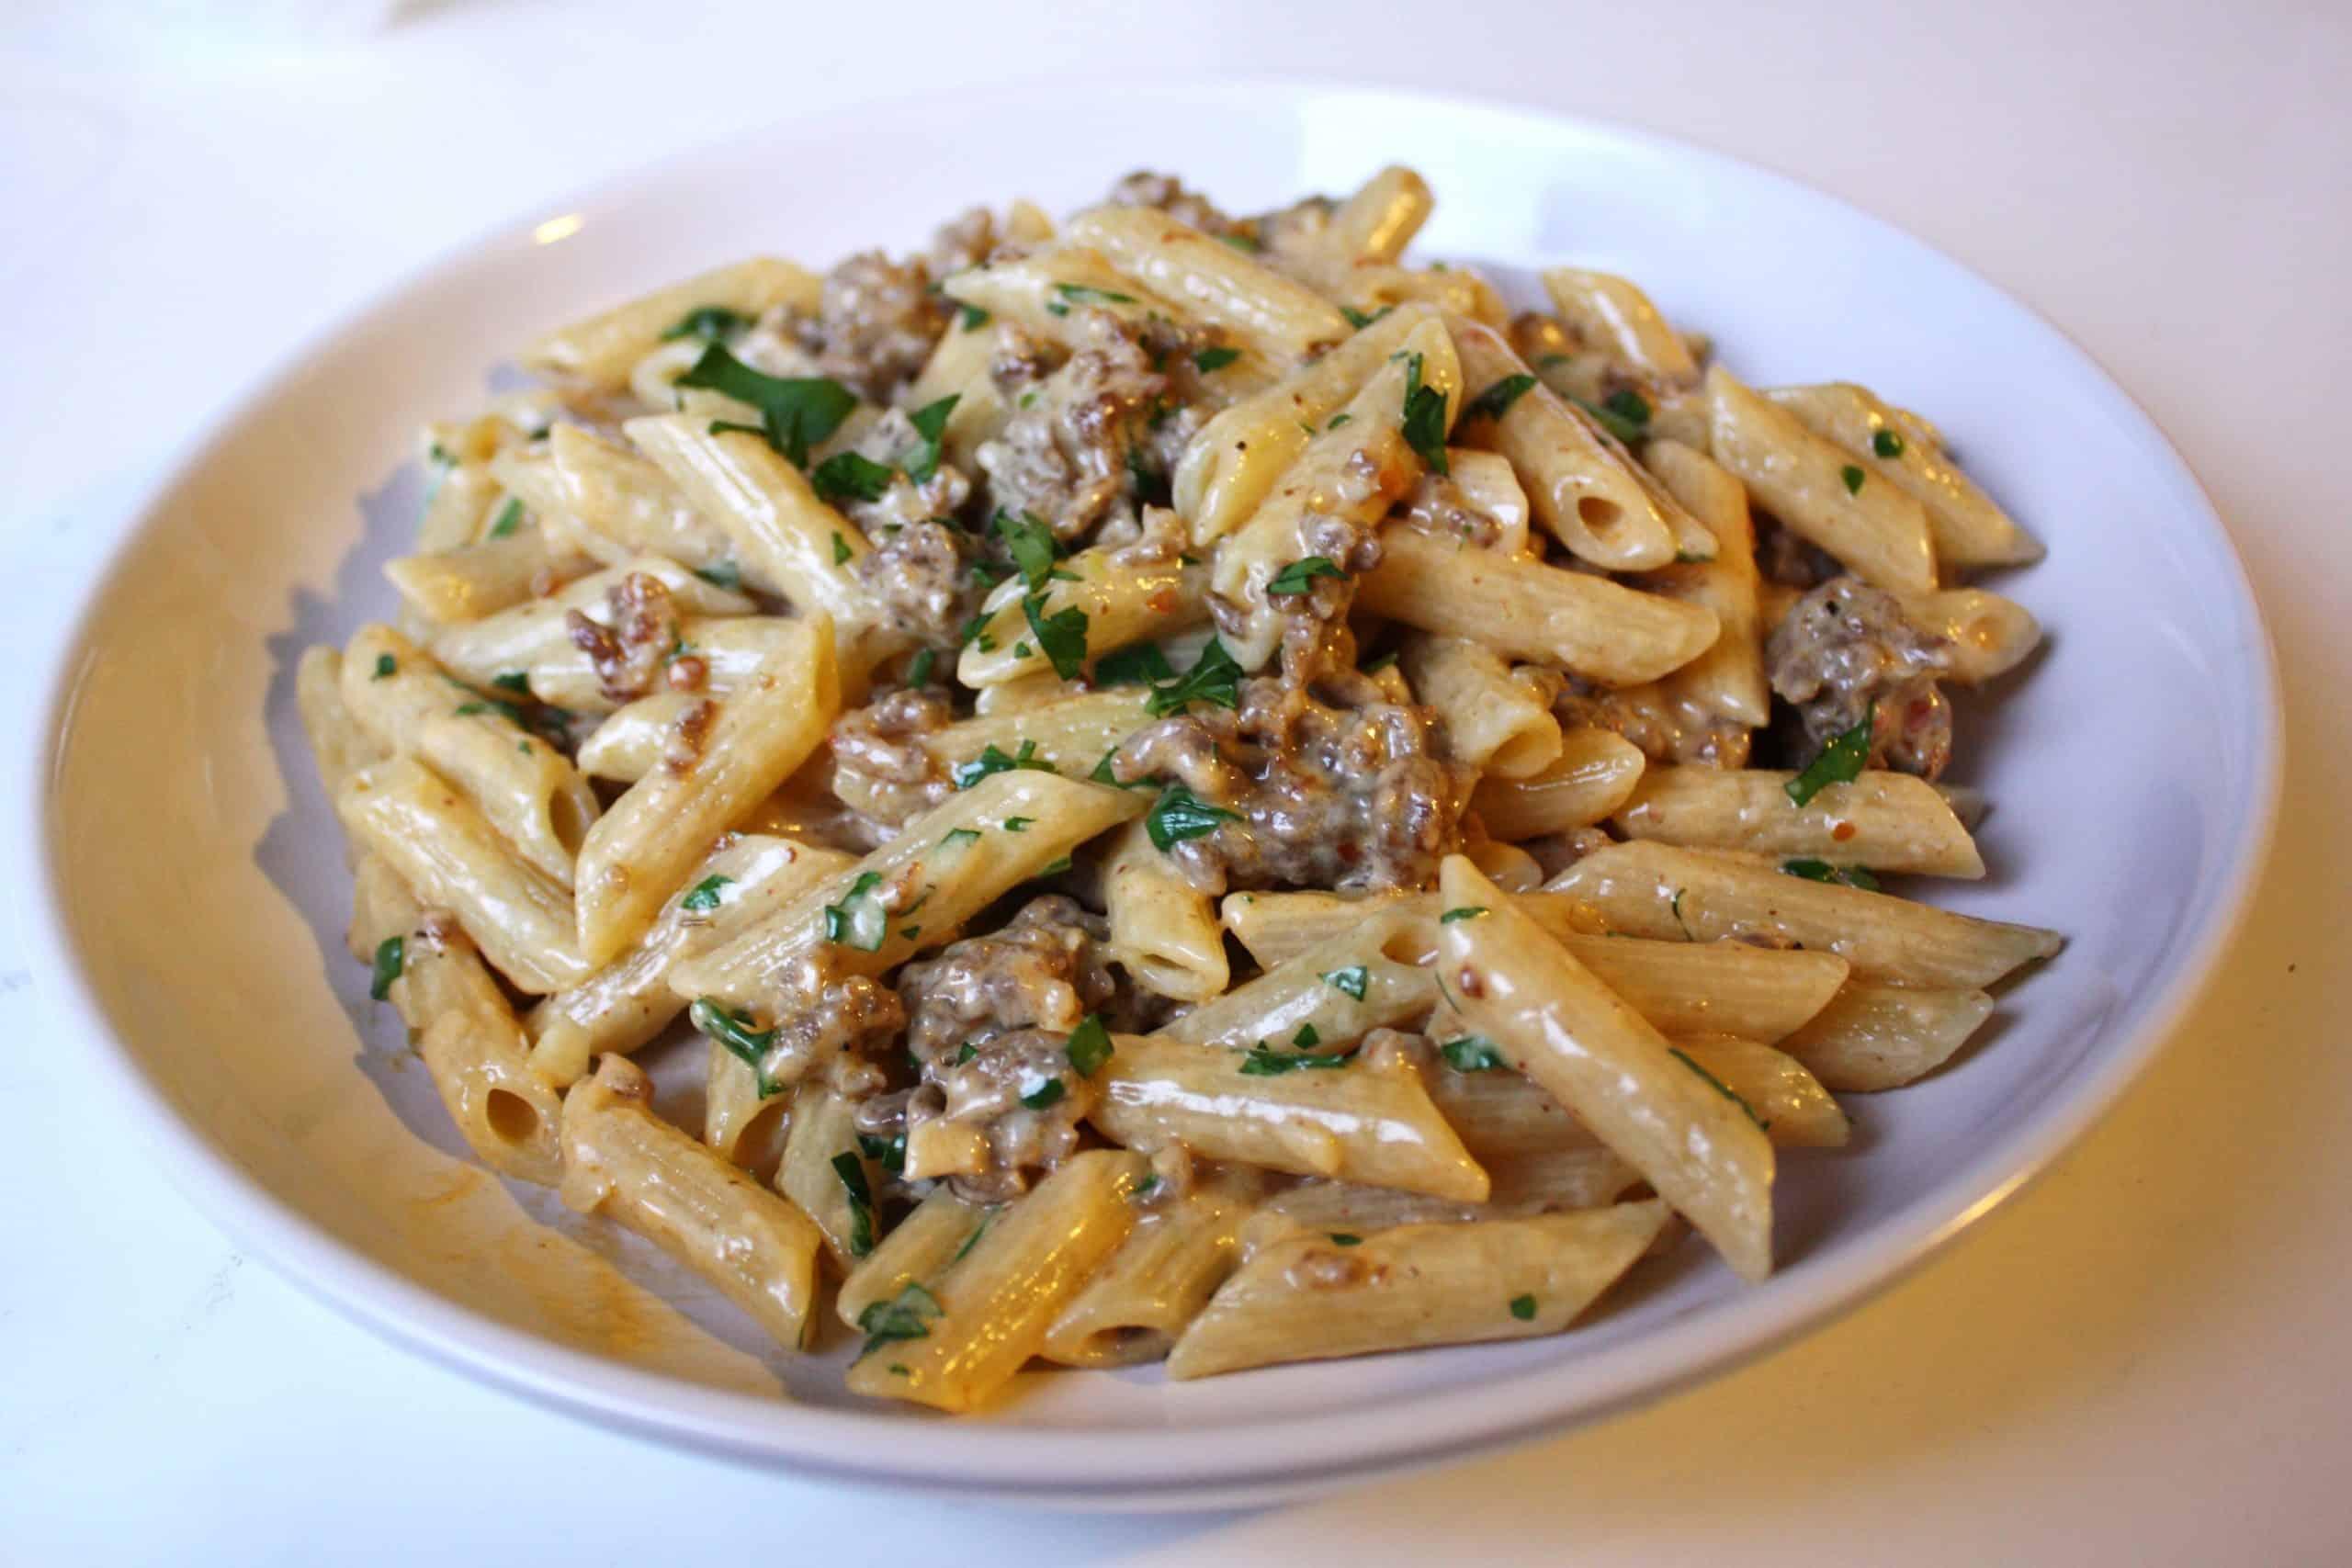 Sausage pasta recipe cheat's ragù| Photo: alanagkelly / Flickr